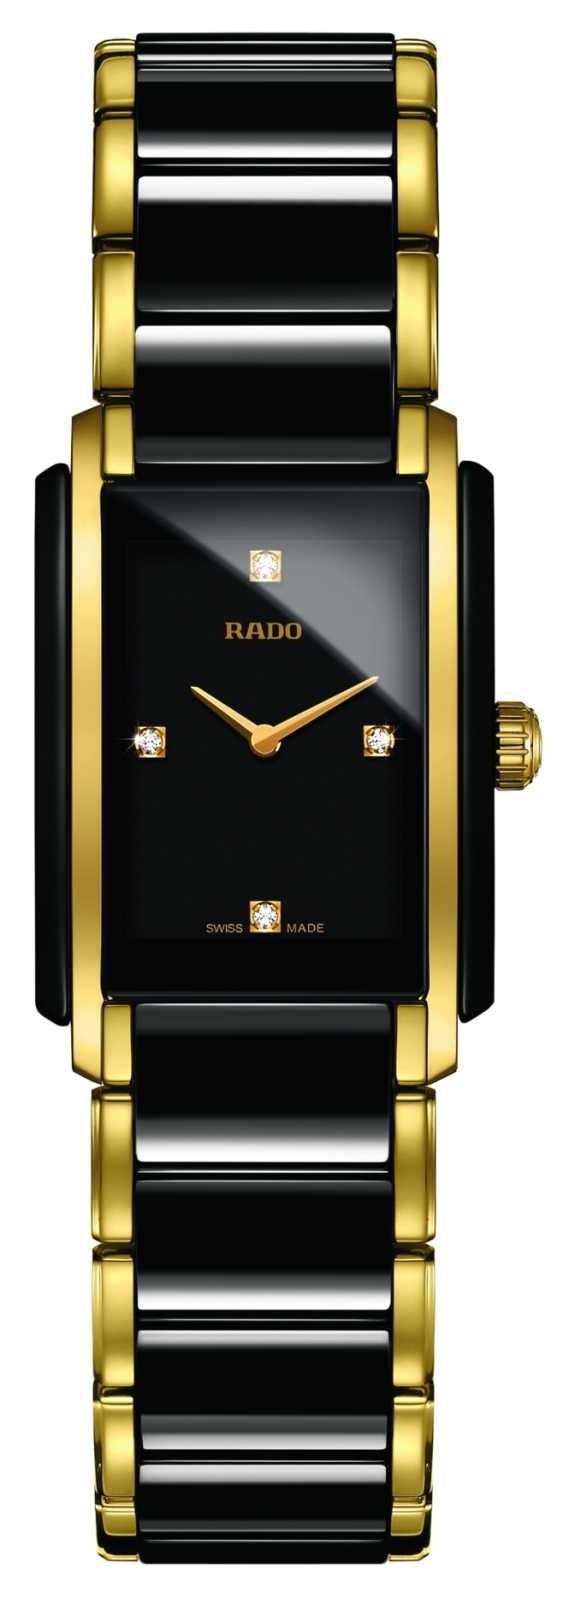 RADO Integral Diamonds High-Tech Ceramic Square Dial Watch R20845712